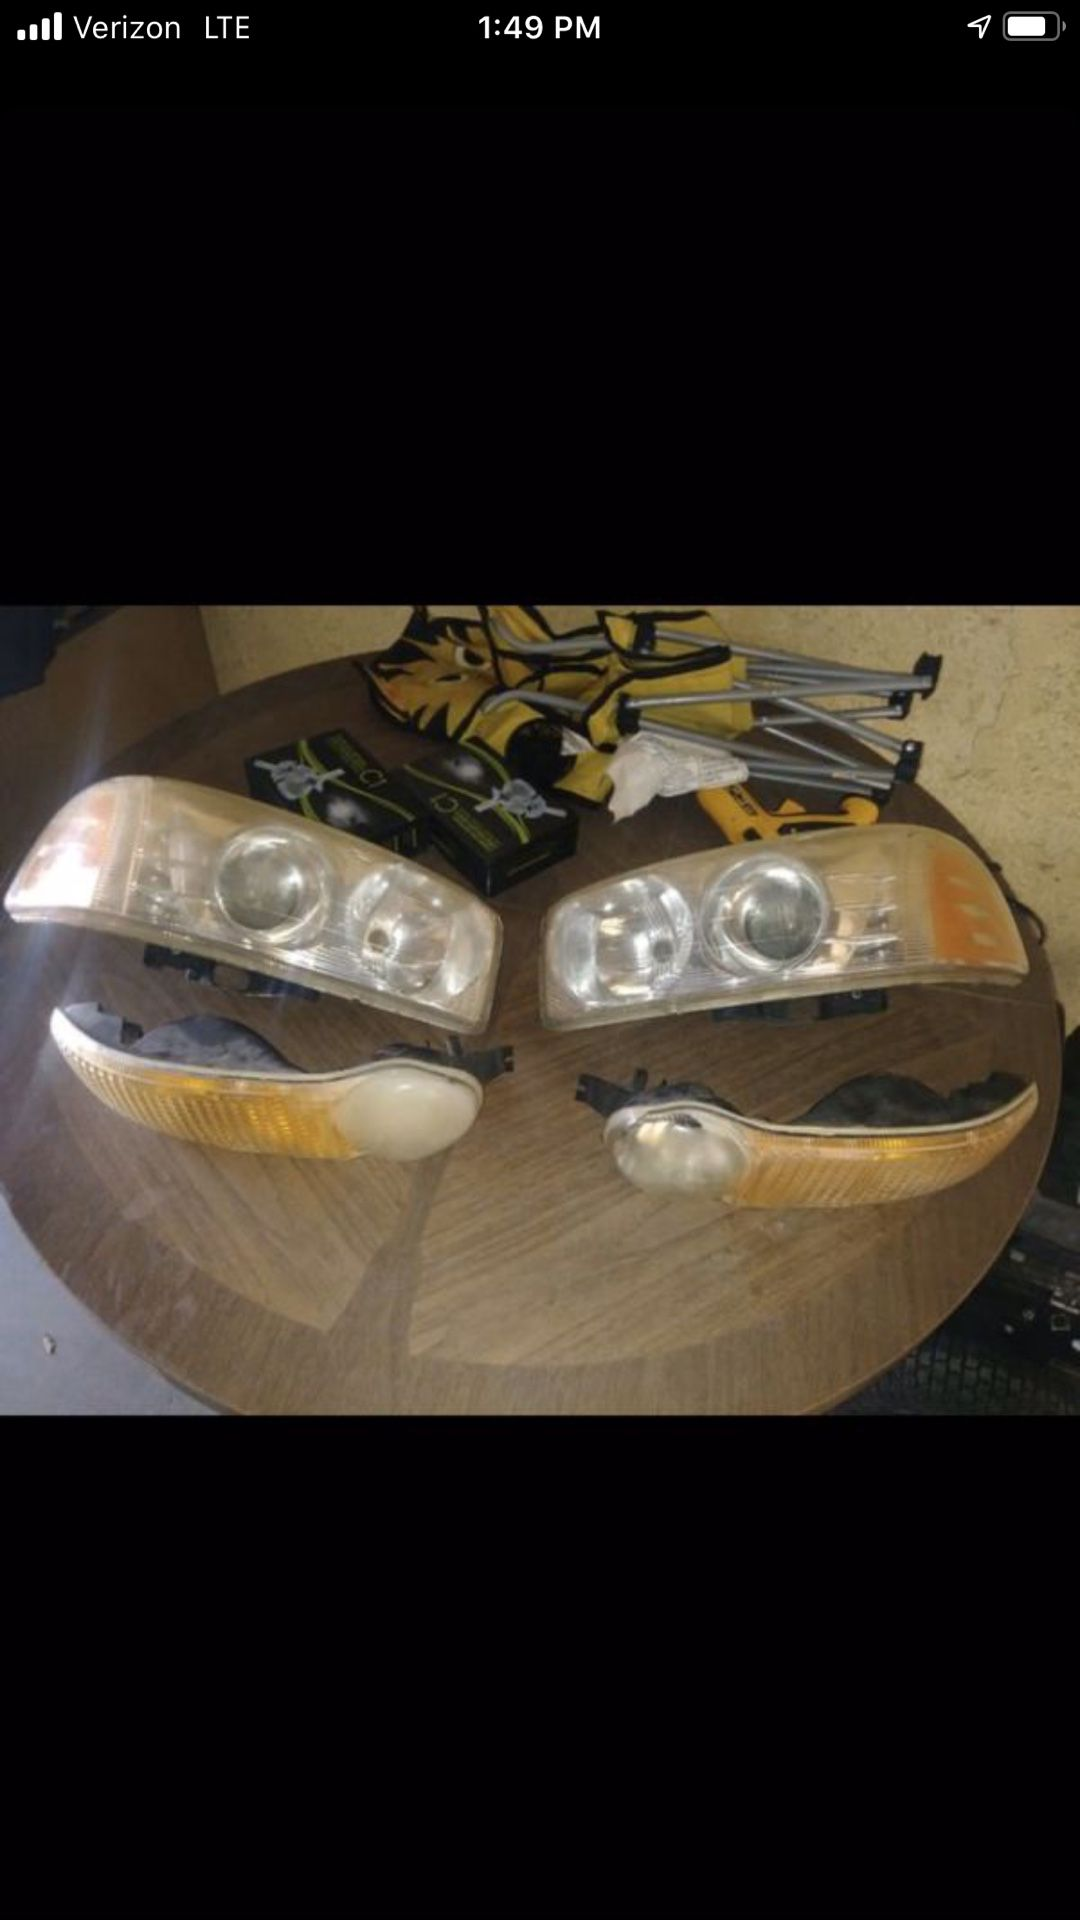 GMC Denali oem headlight with projector and corner lights